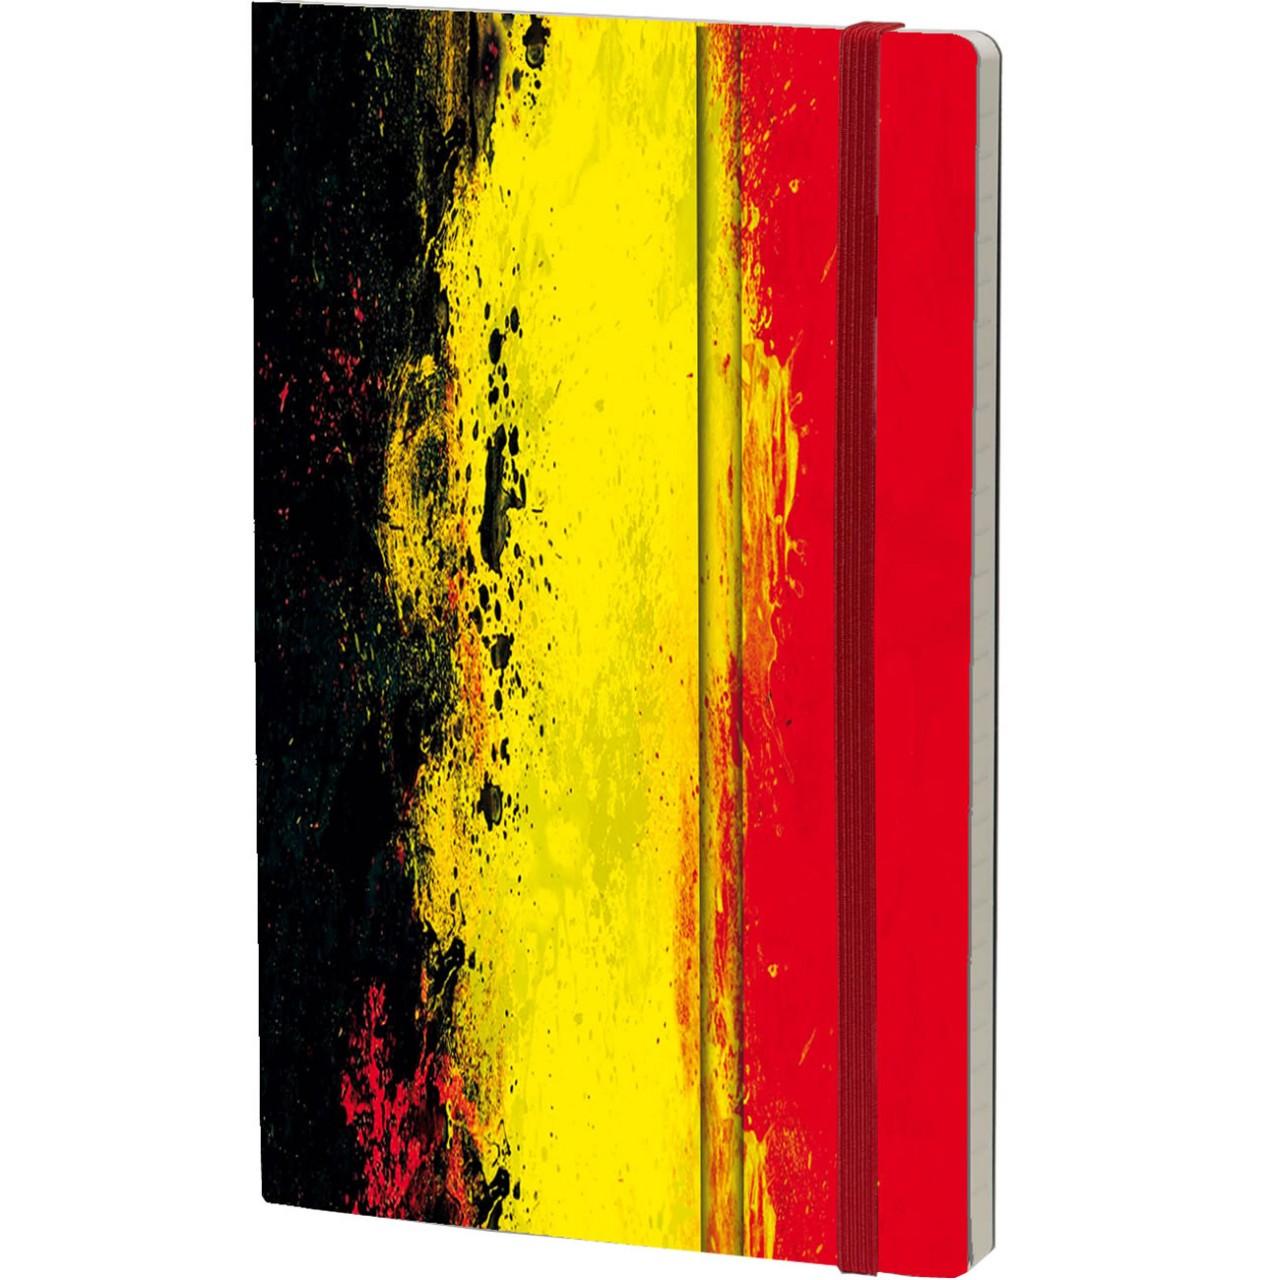 Stifflexible Notizbuch HISTORICAL NOTES 13 x 21 cm 192 S., EENDRACHT MAAKT MACHT - L'UNION FAIT LA FORCE (Belgium Flag)